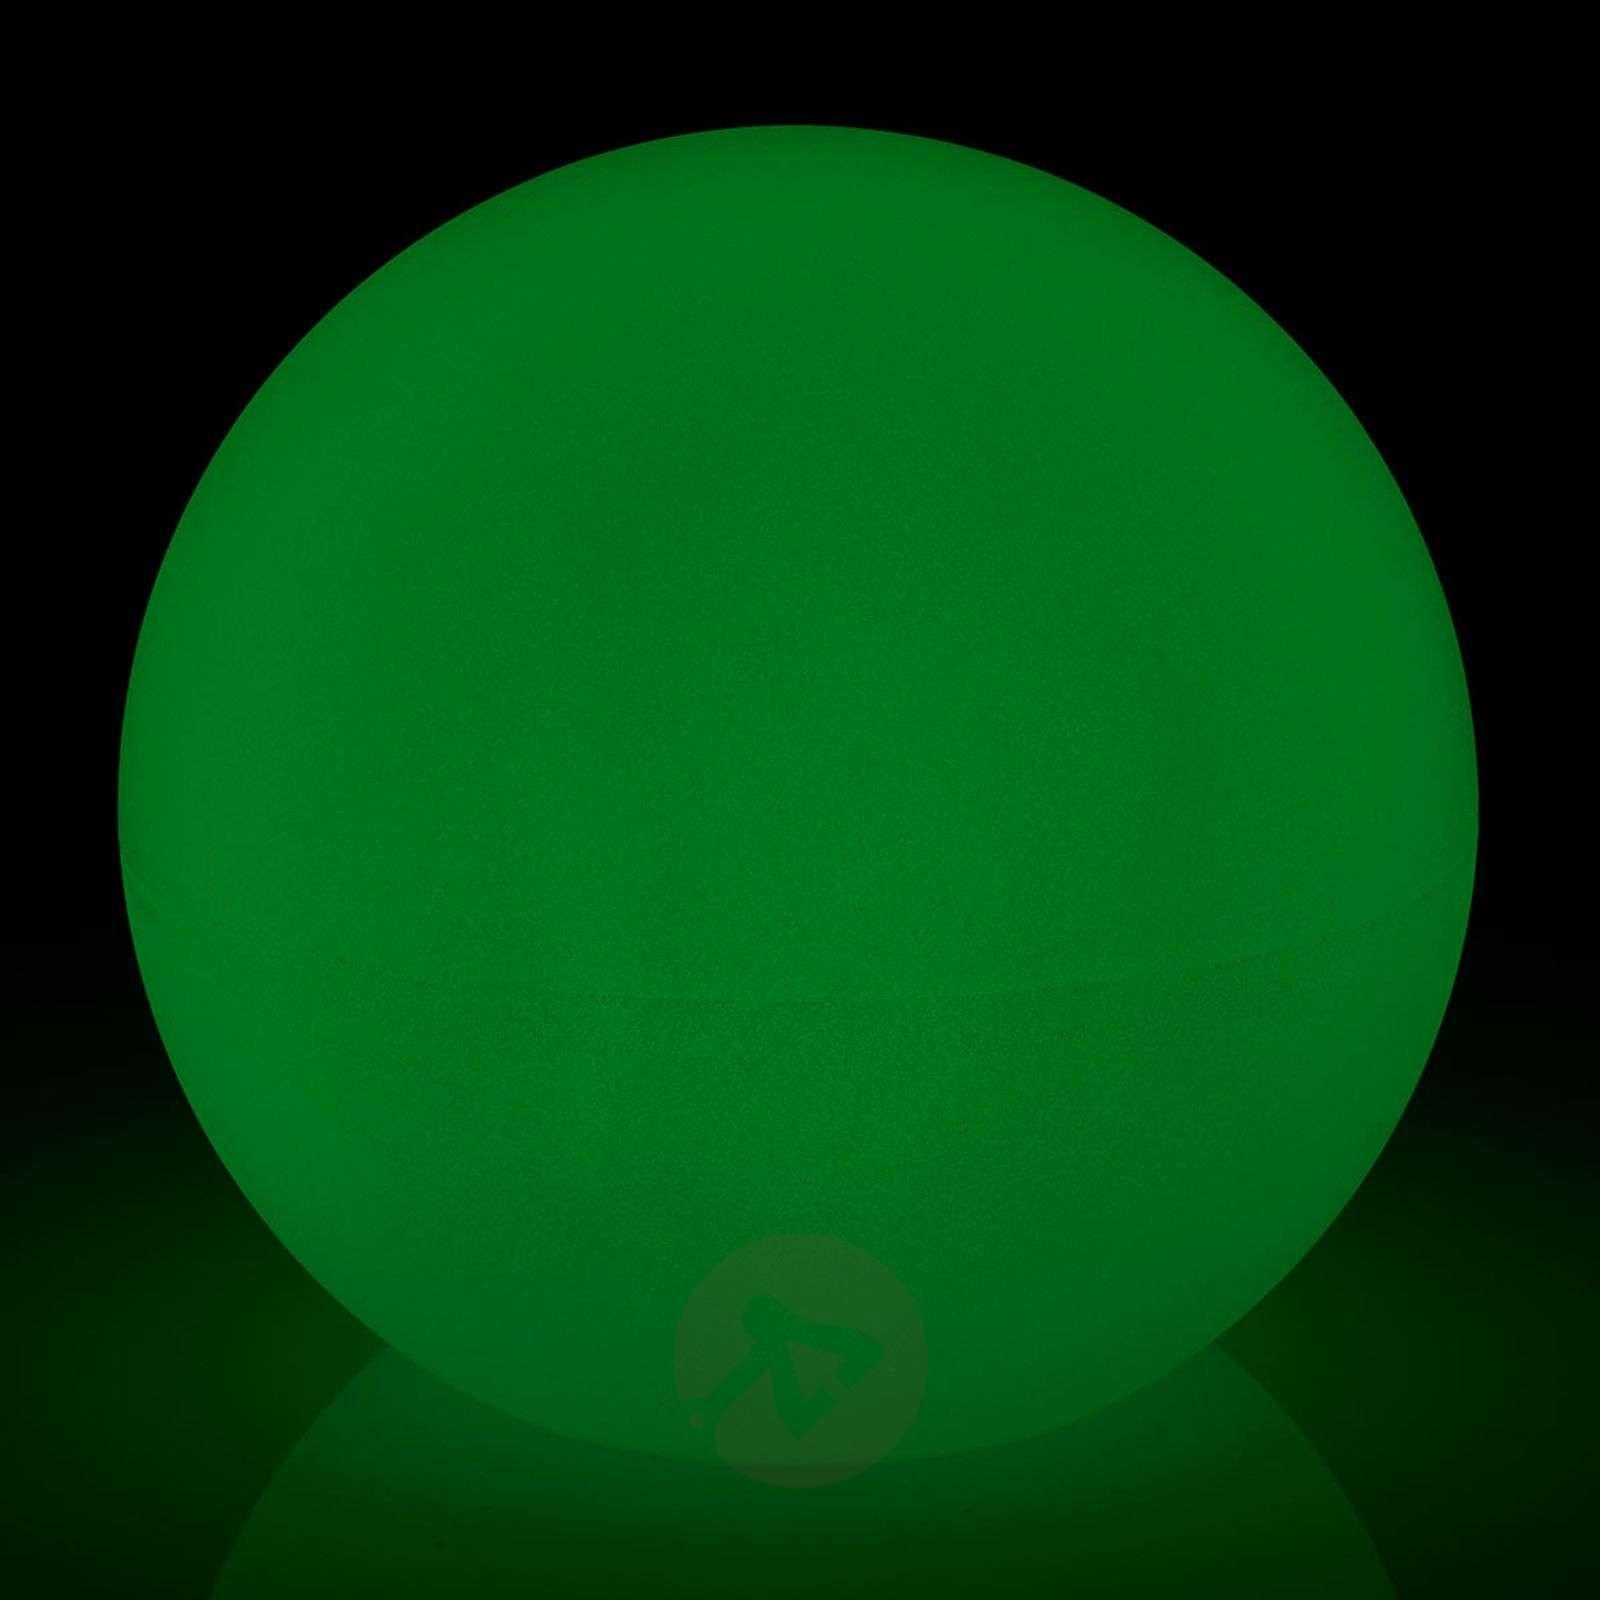 LED-koristevalaisin ulos Shining Globe-1004089X-021